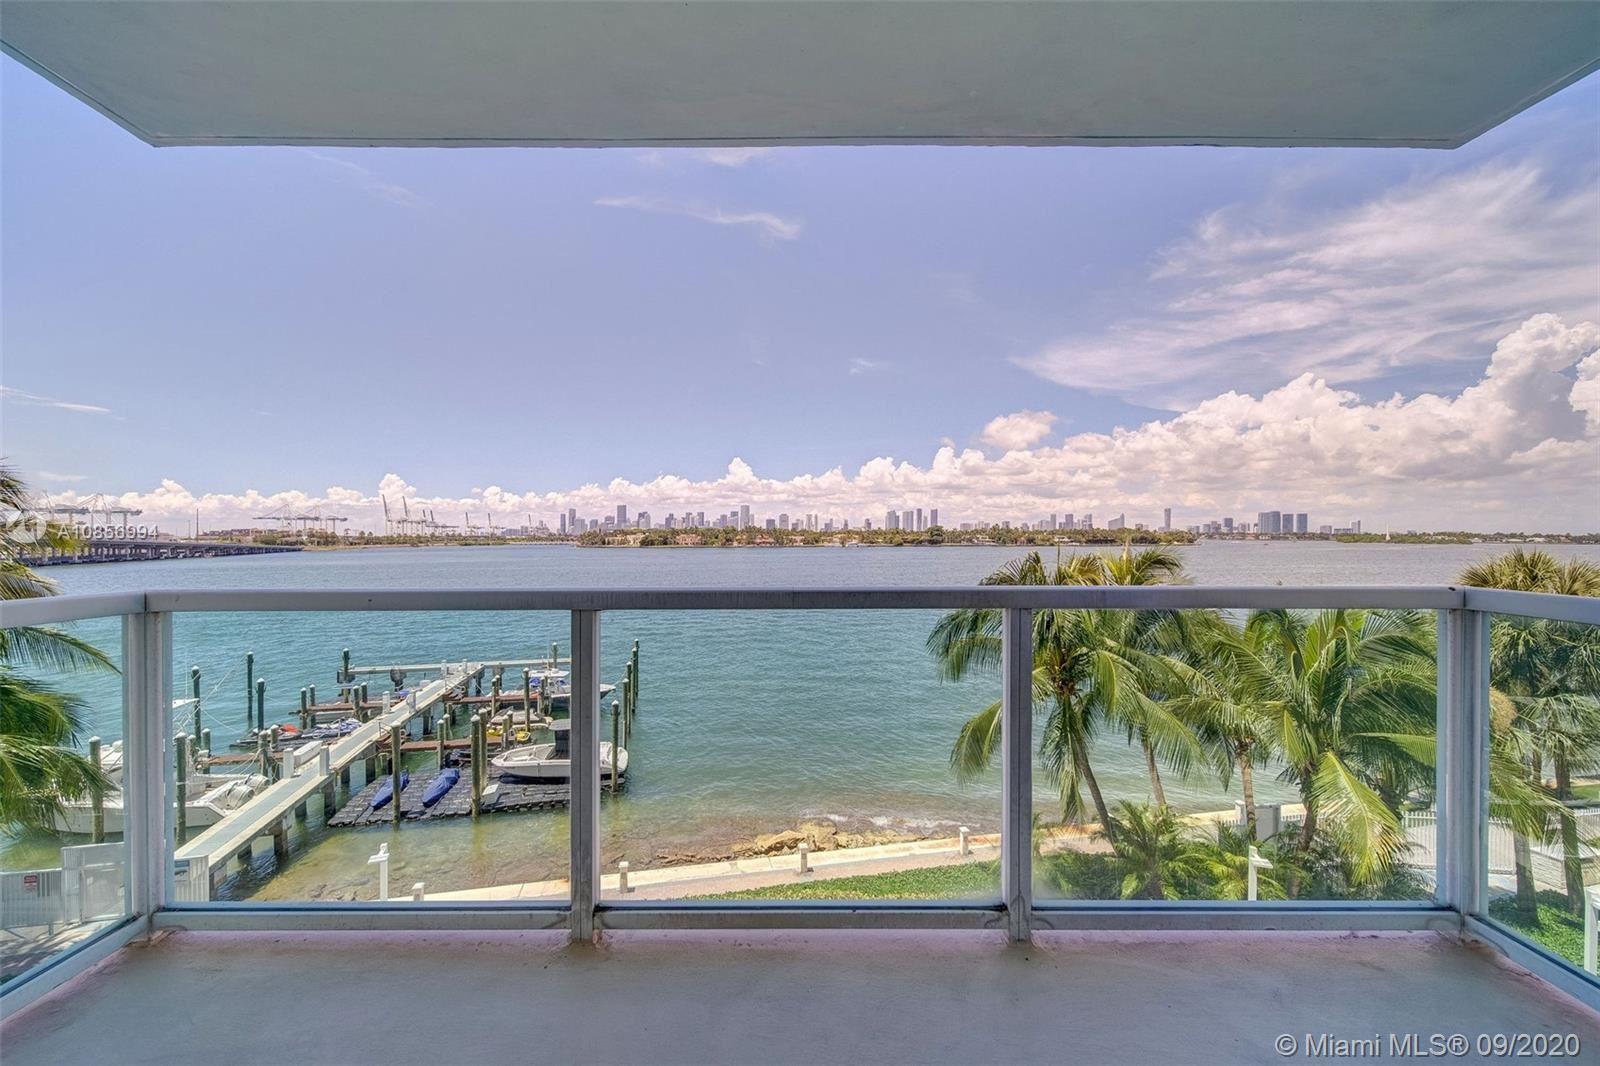 650 West Ave #405, Miami Beach, FL 33139 - #: A10856994